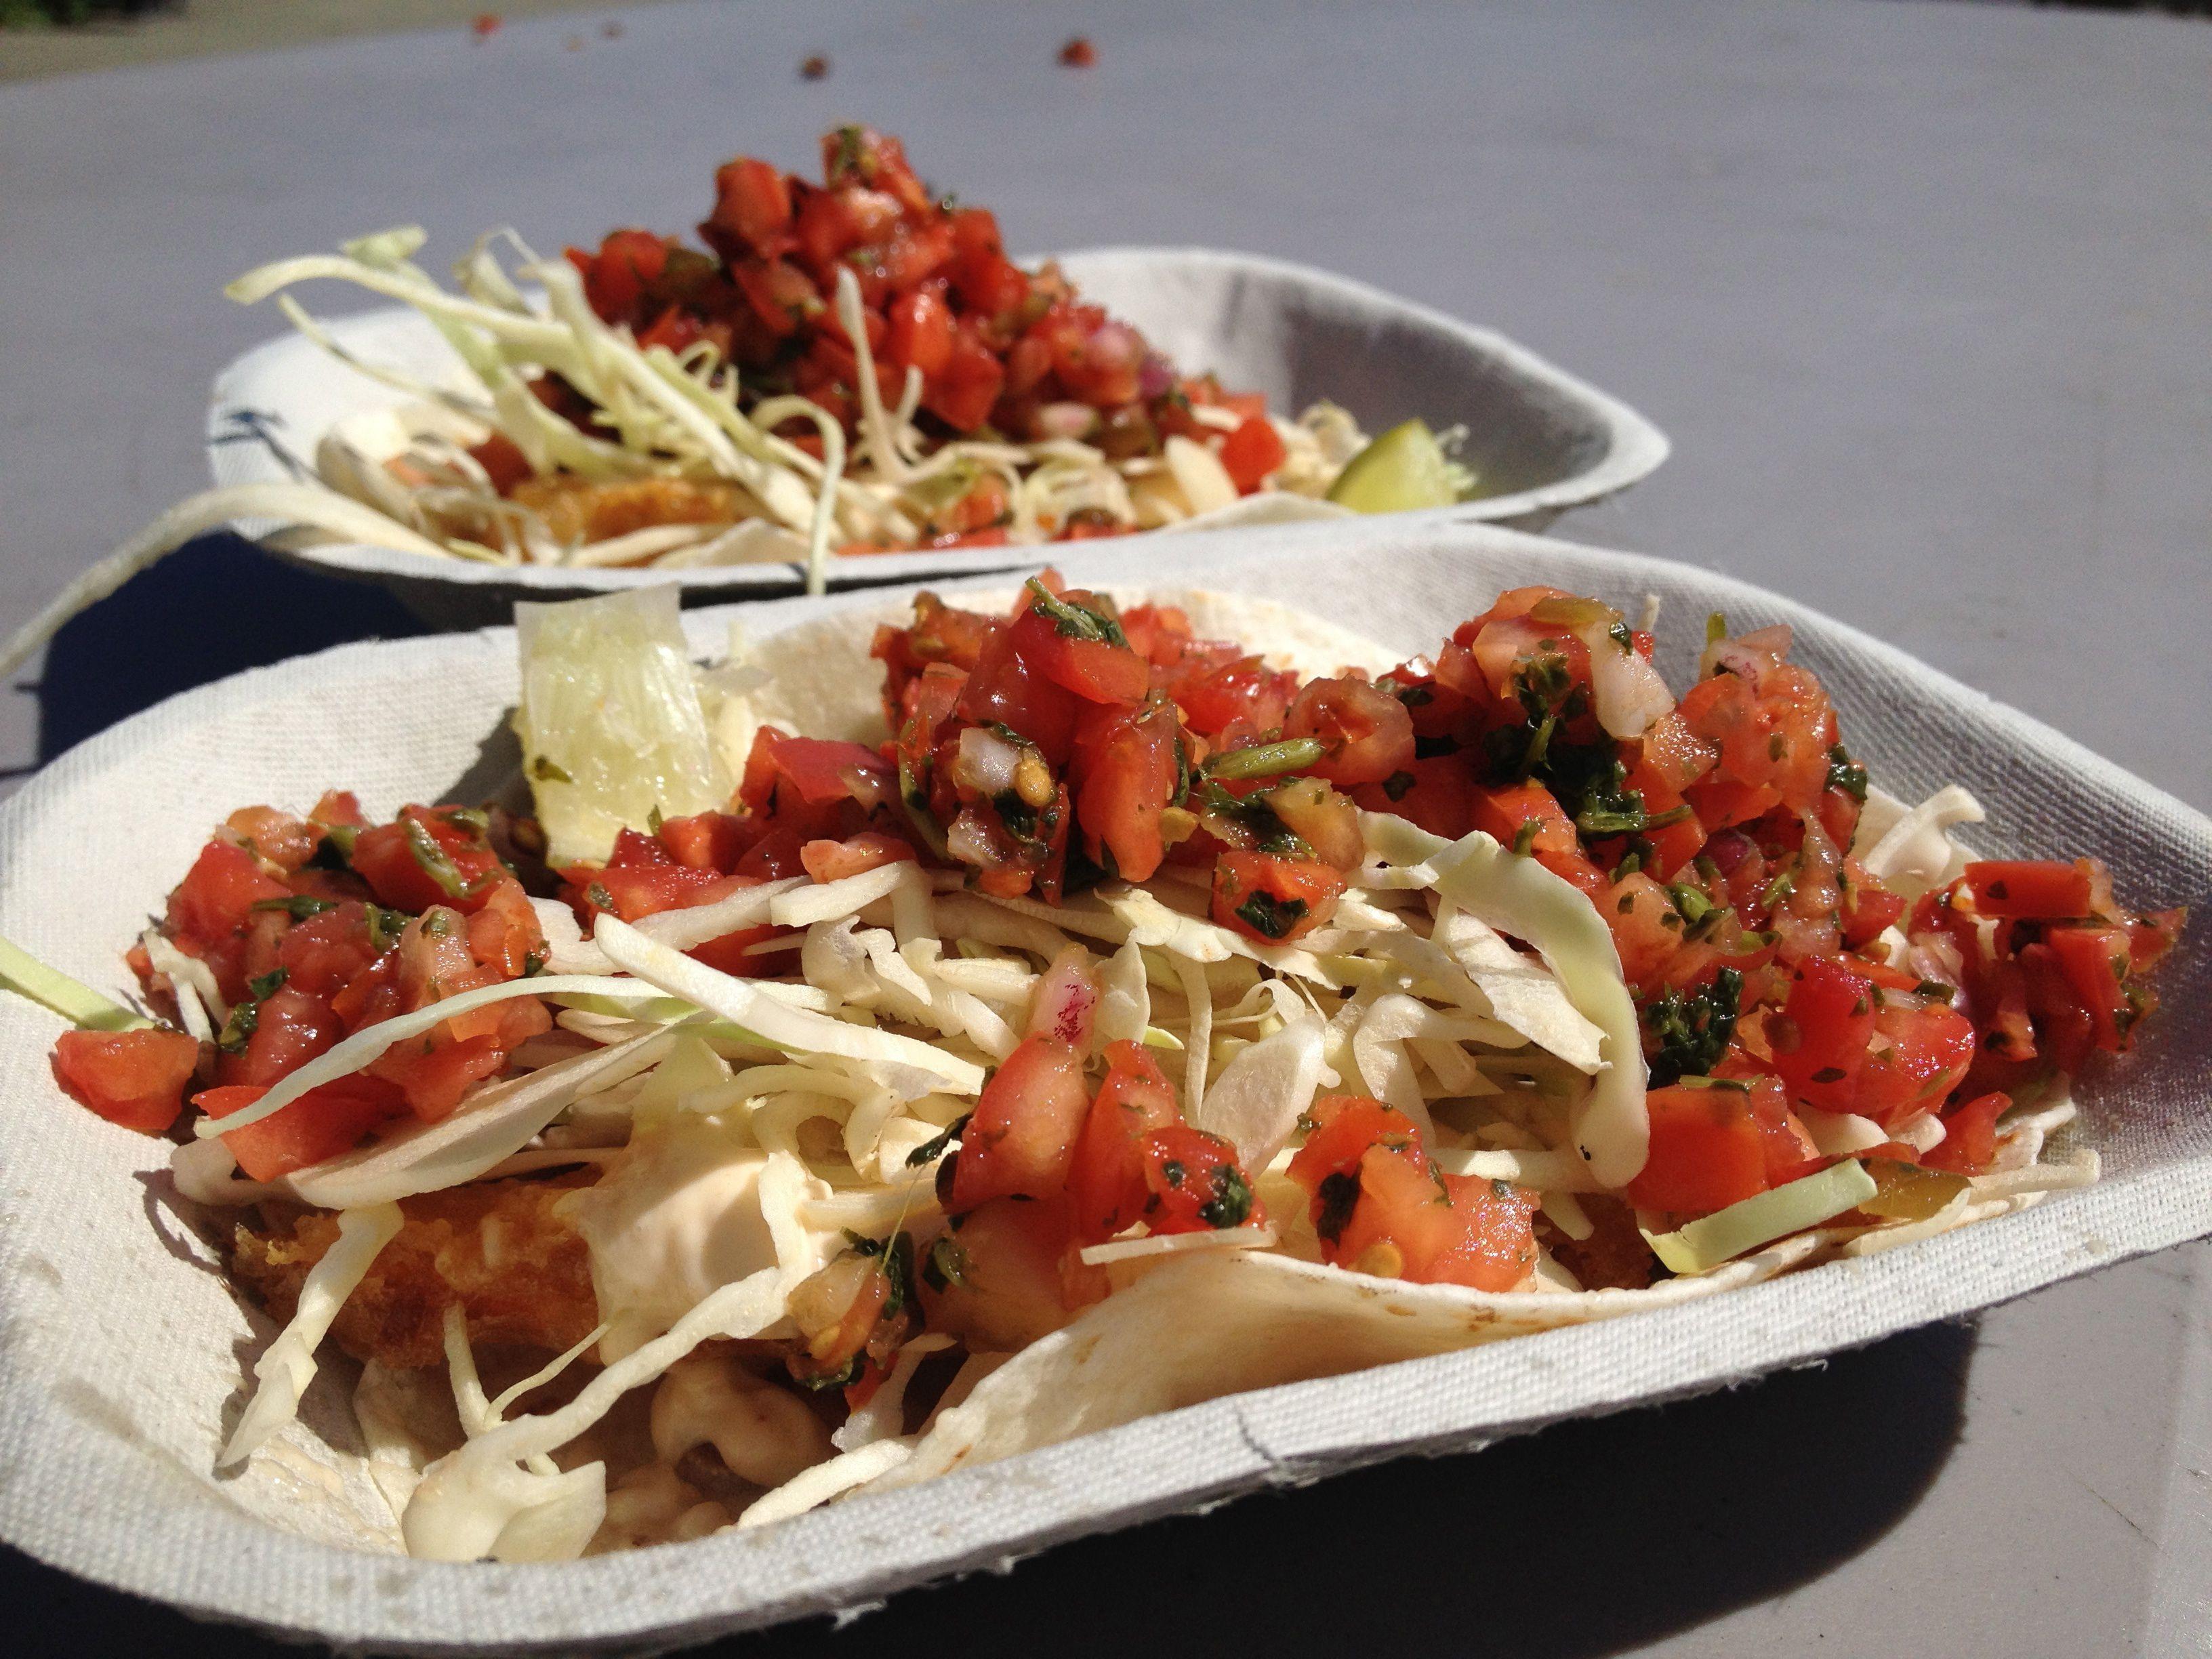 Tacos served at Tacofino Victoria.